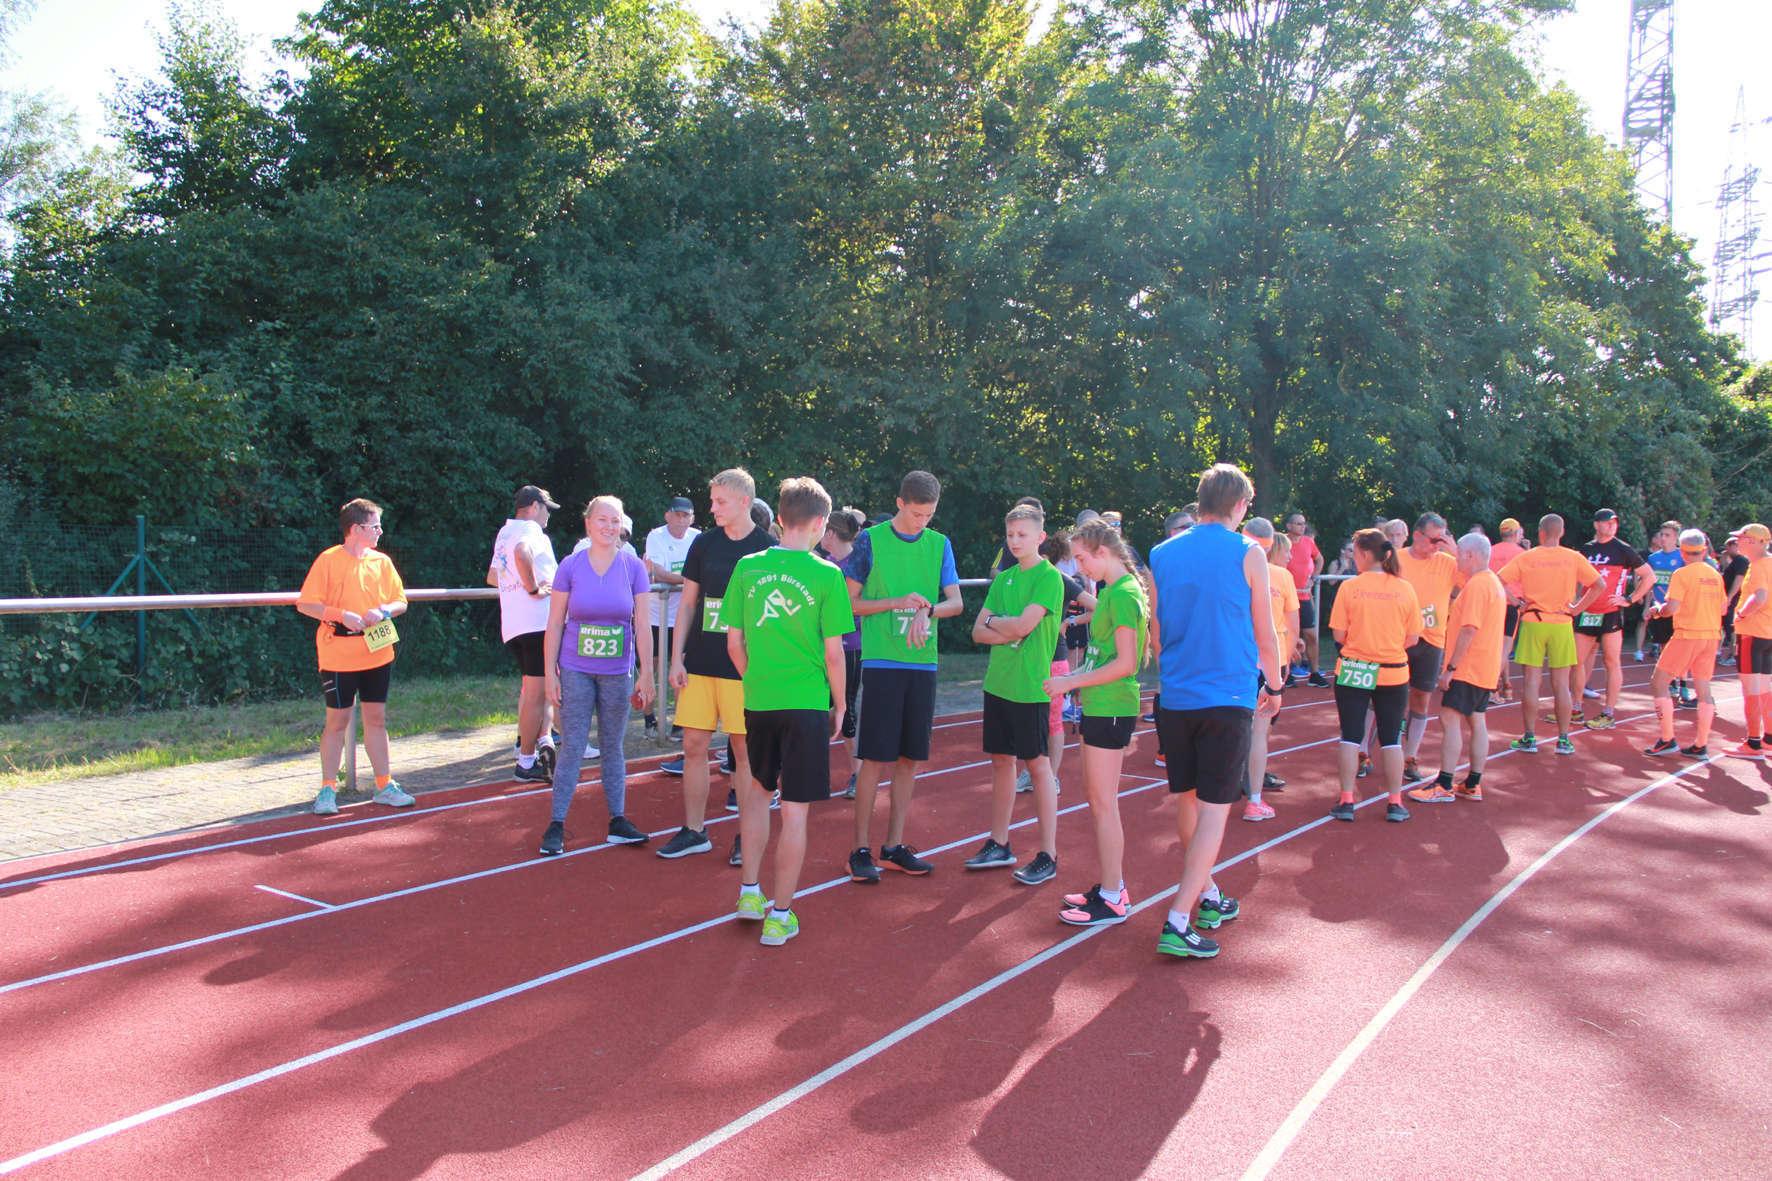 Volkslauf-2019-_-06-_-Start-5-km-_-3